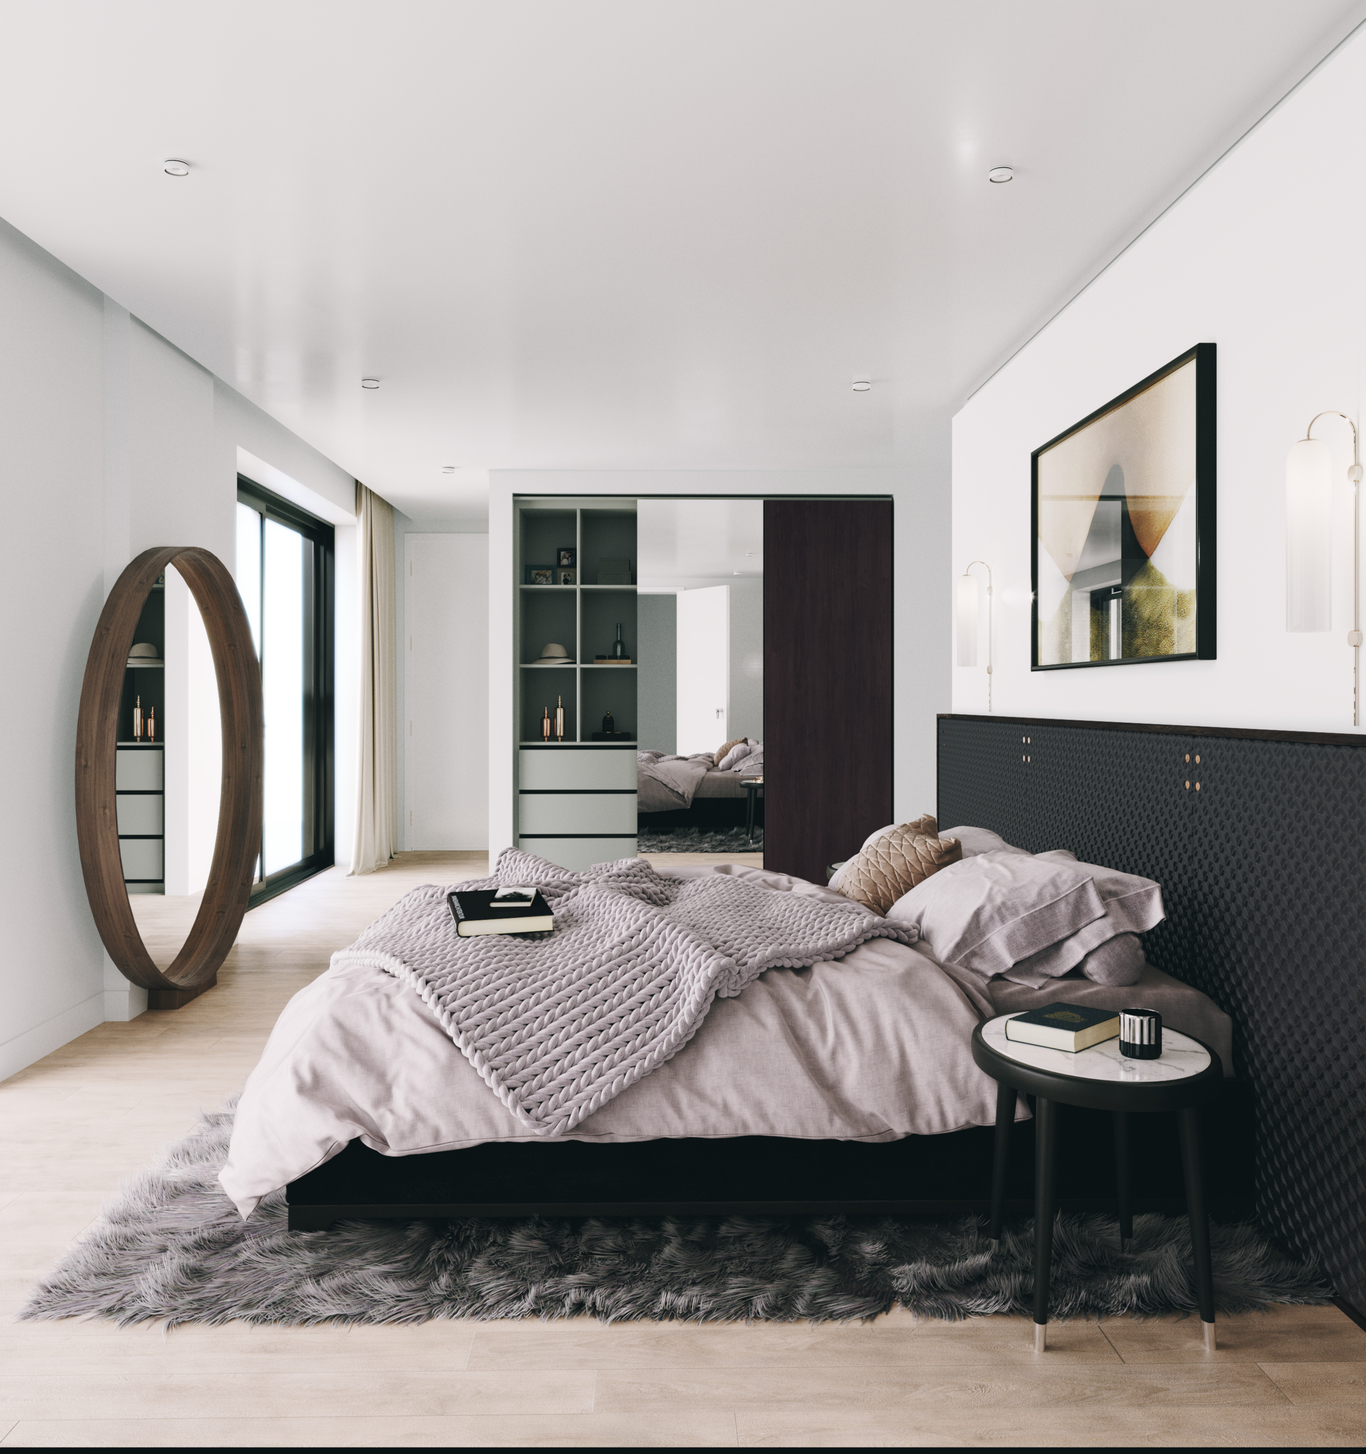 Vicnguyendessign bedroom 1 f213b629 12m5